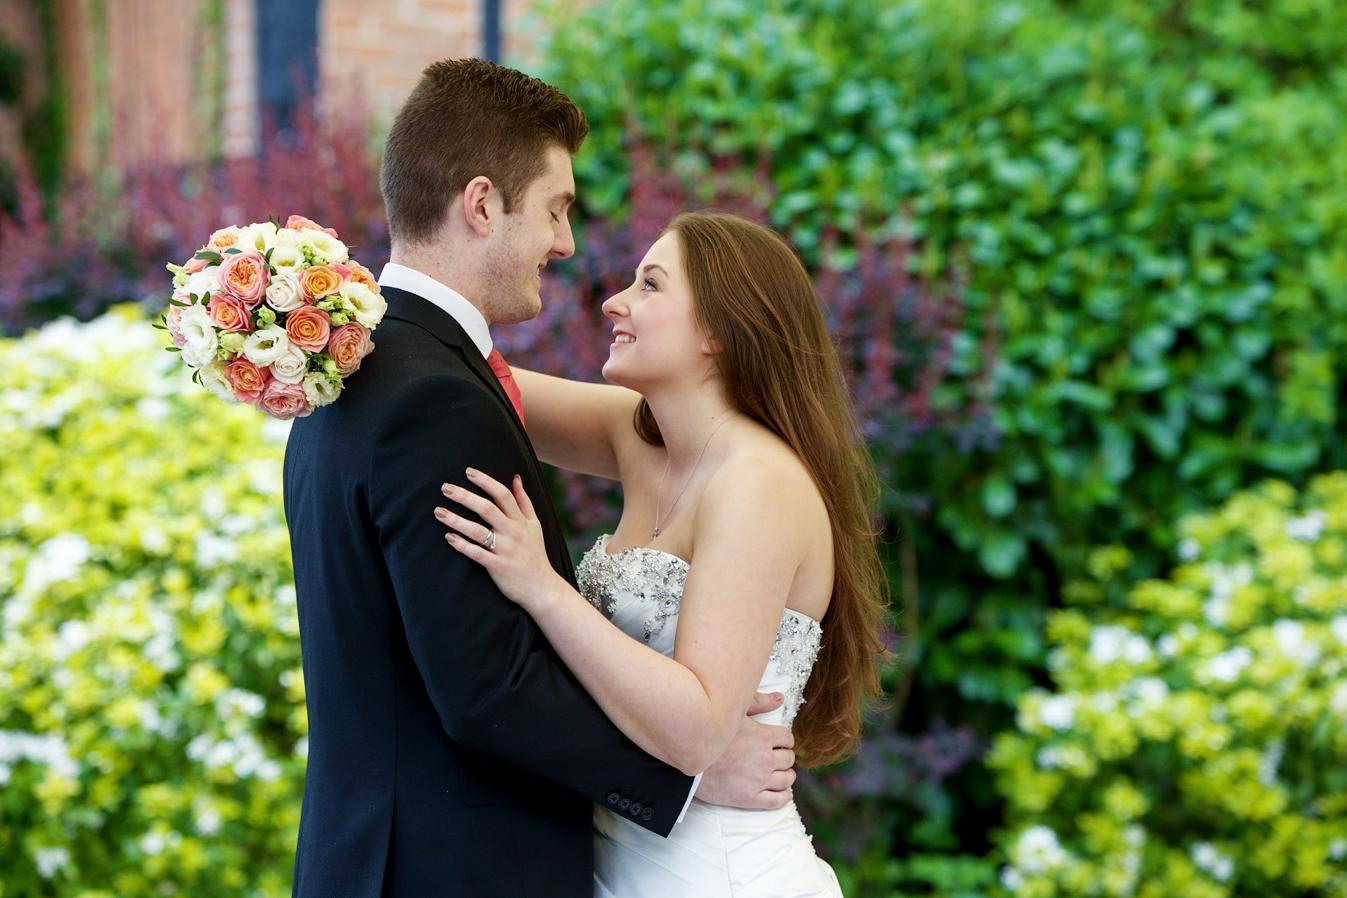 Barns_Hotel_Wedding_Photographer_Bedford_009.jpg